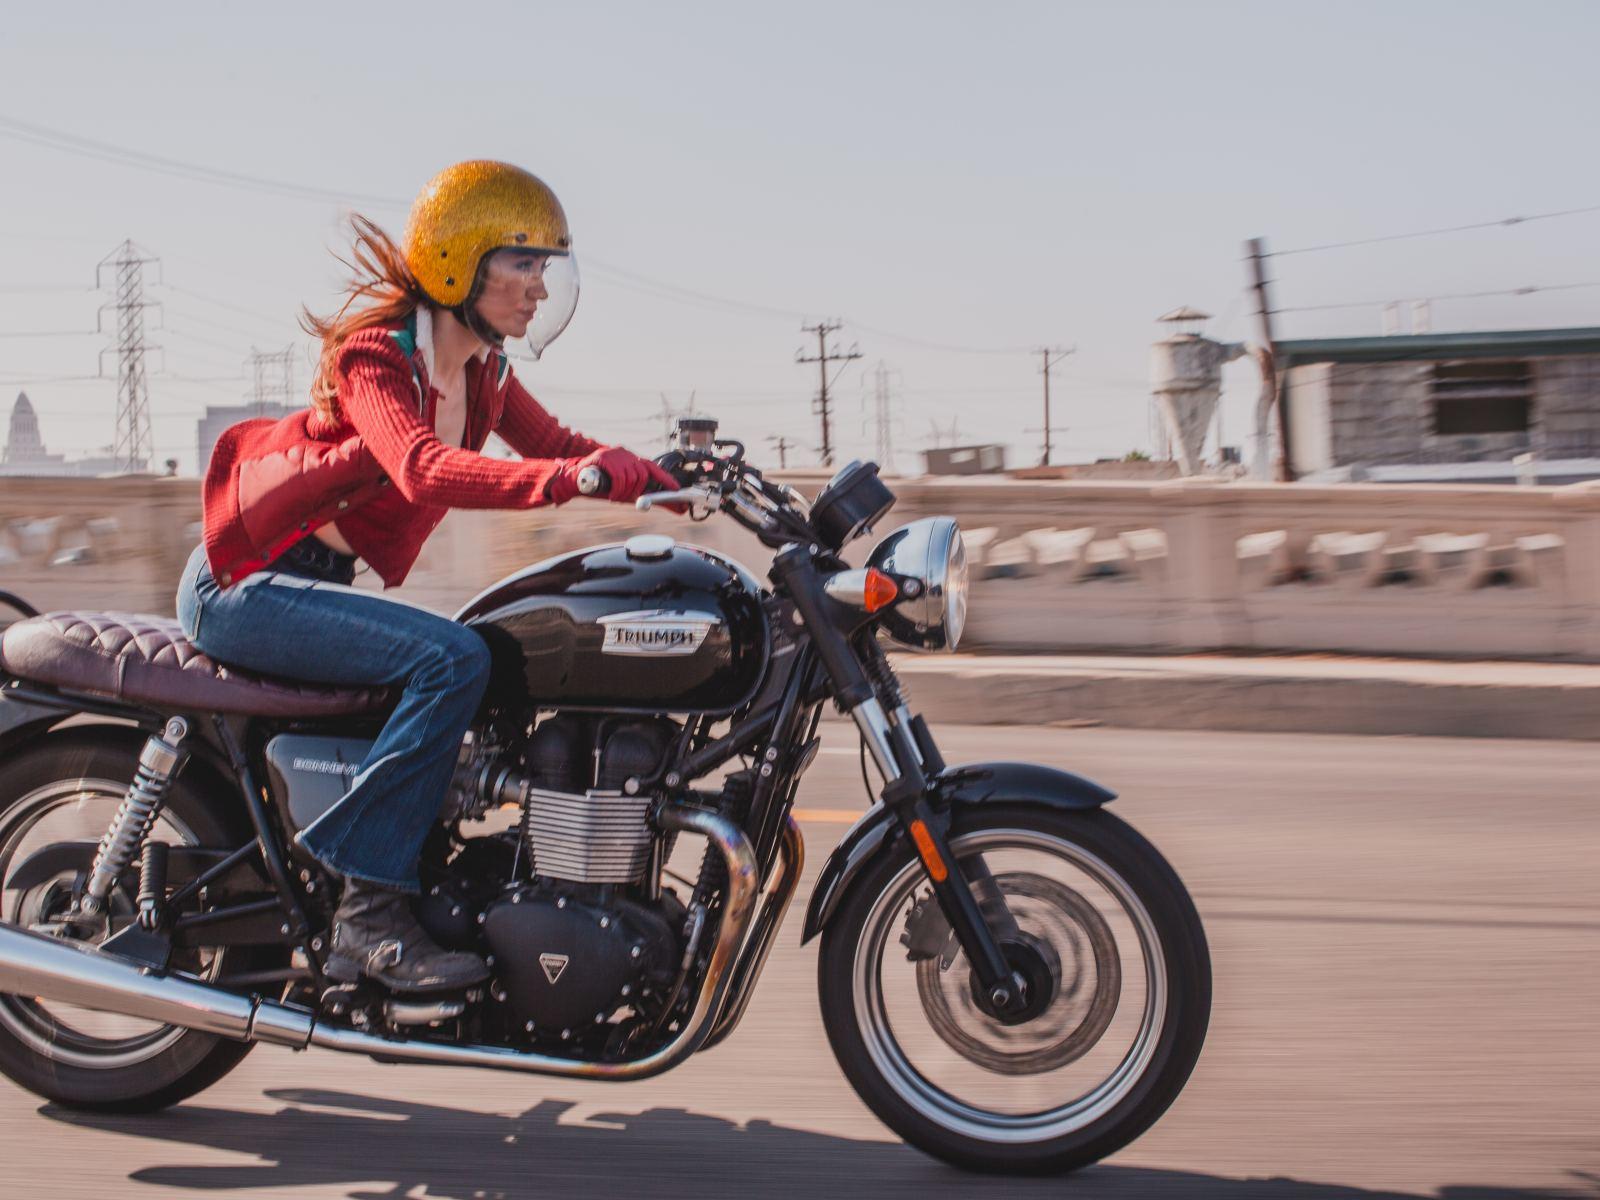 Motorcycle expert Irena Murphy crosses a bridge in Downtown L.A.